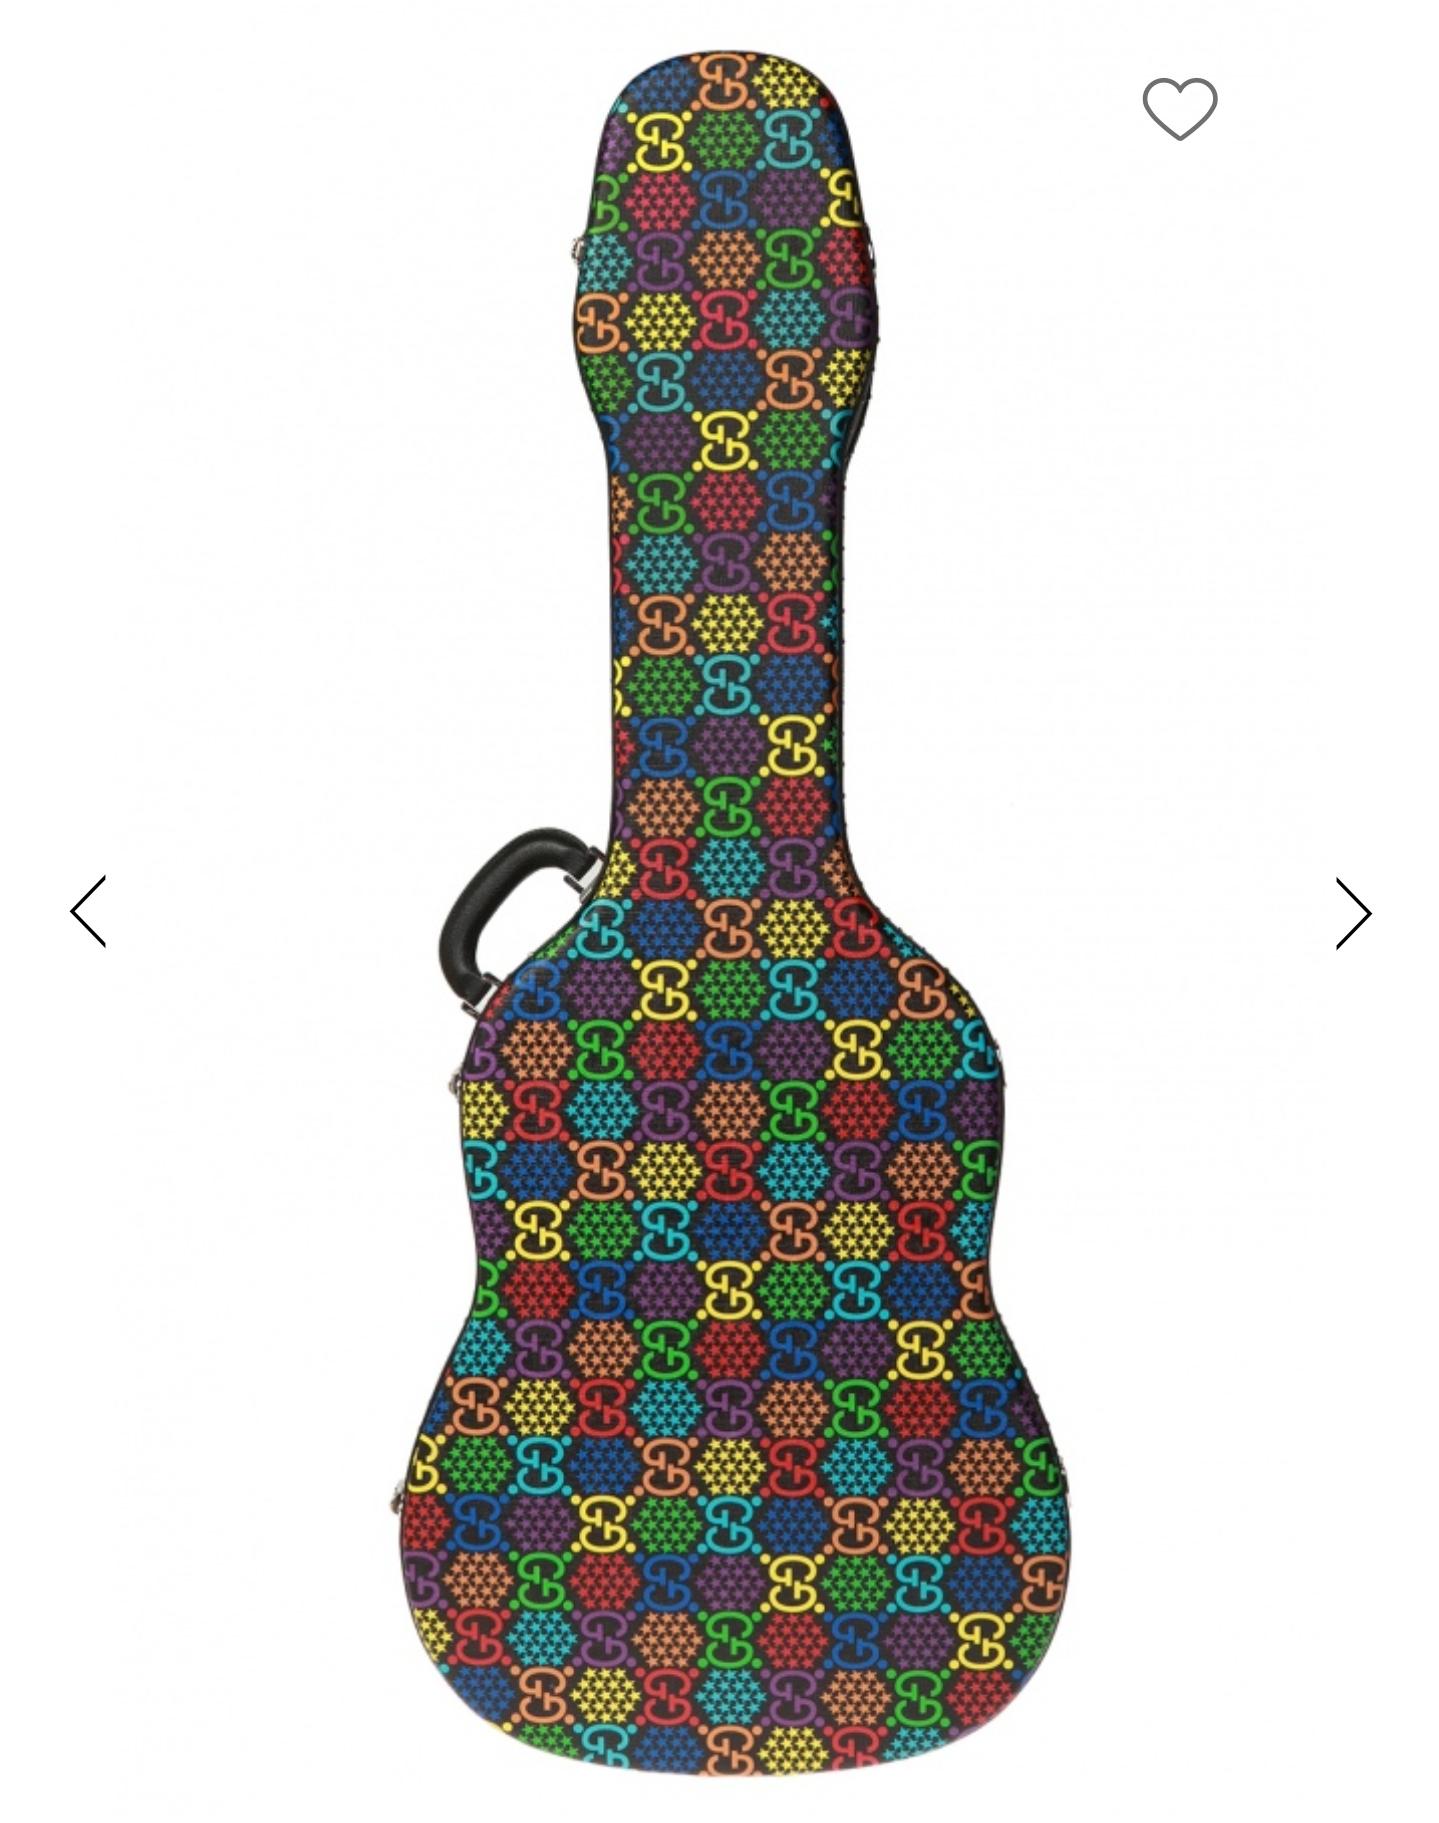 VITKAC : Futerał na gitarę GUCCI